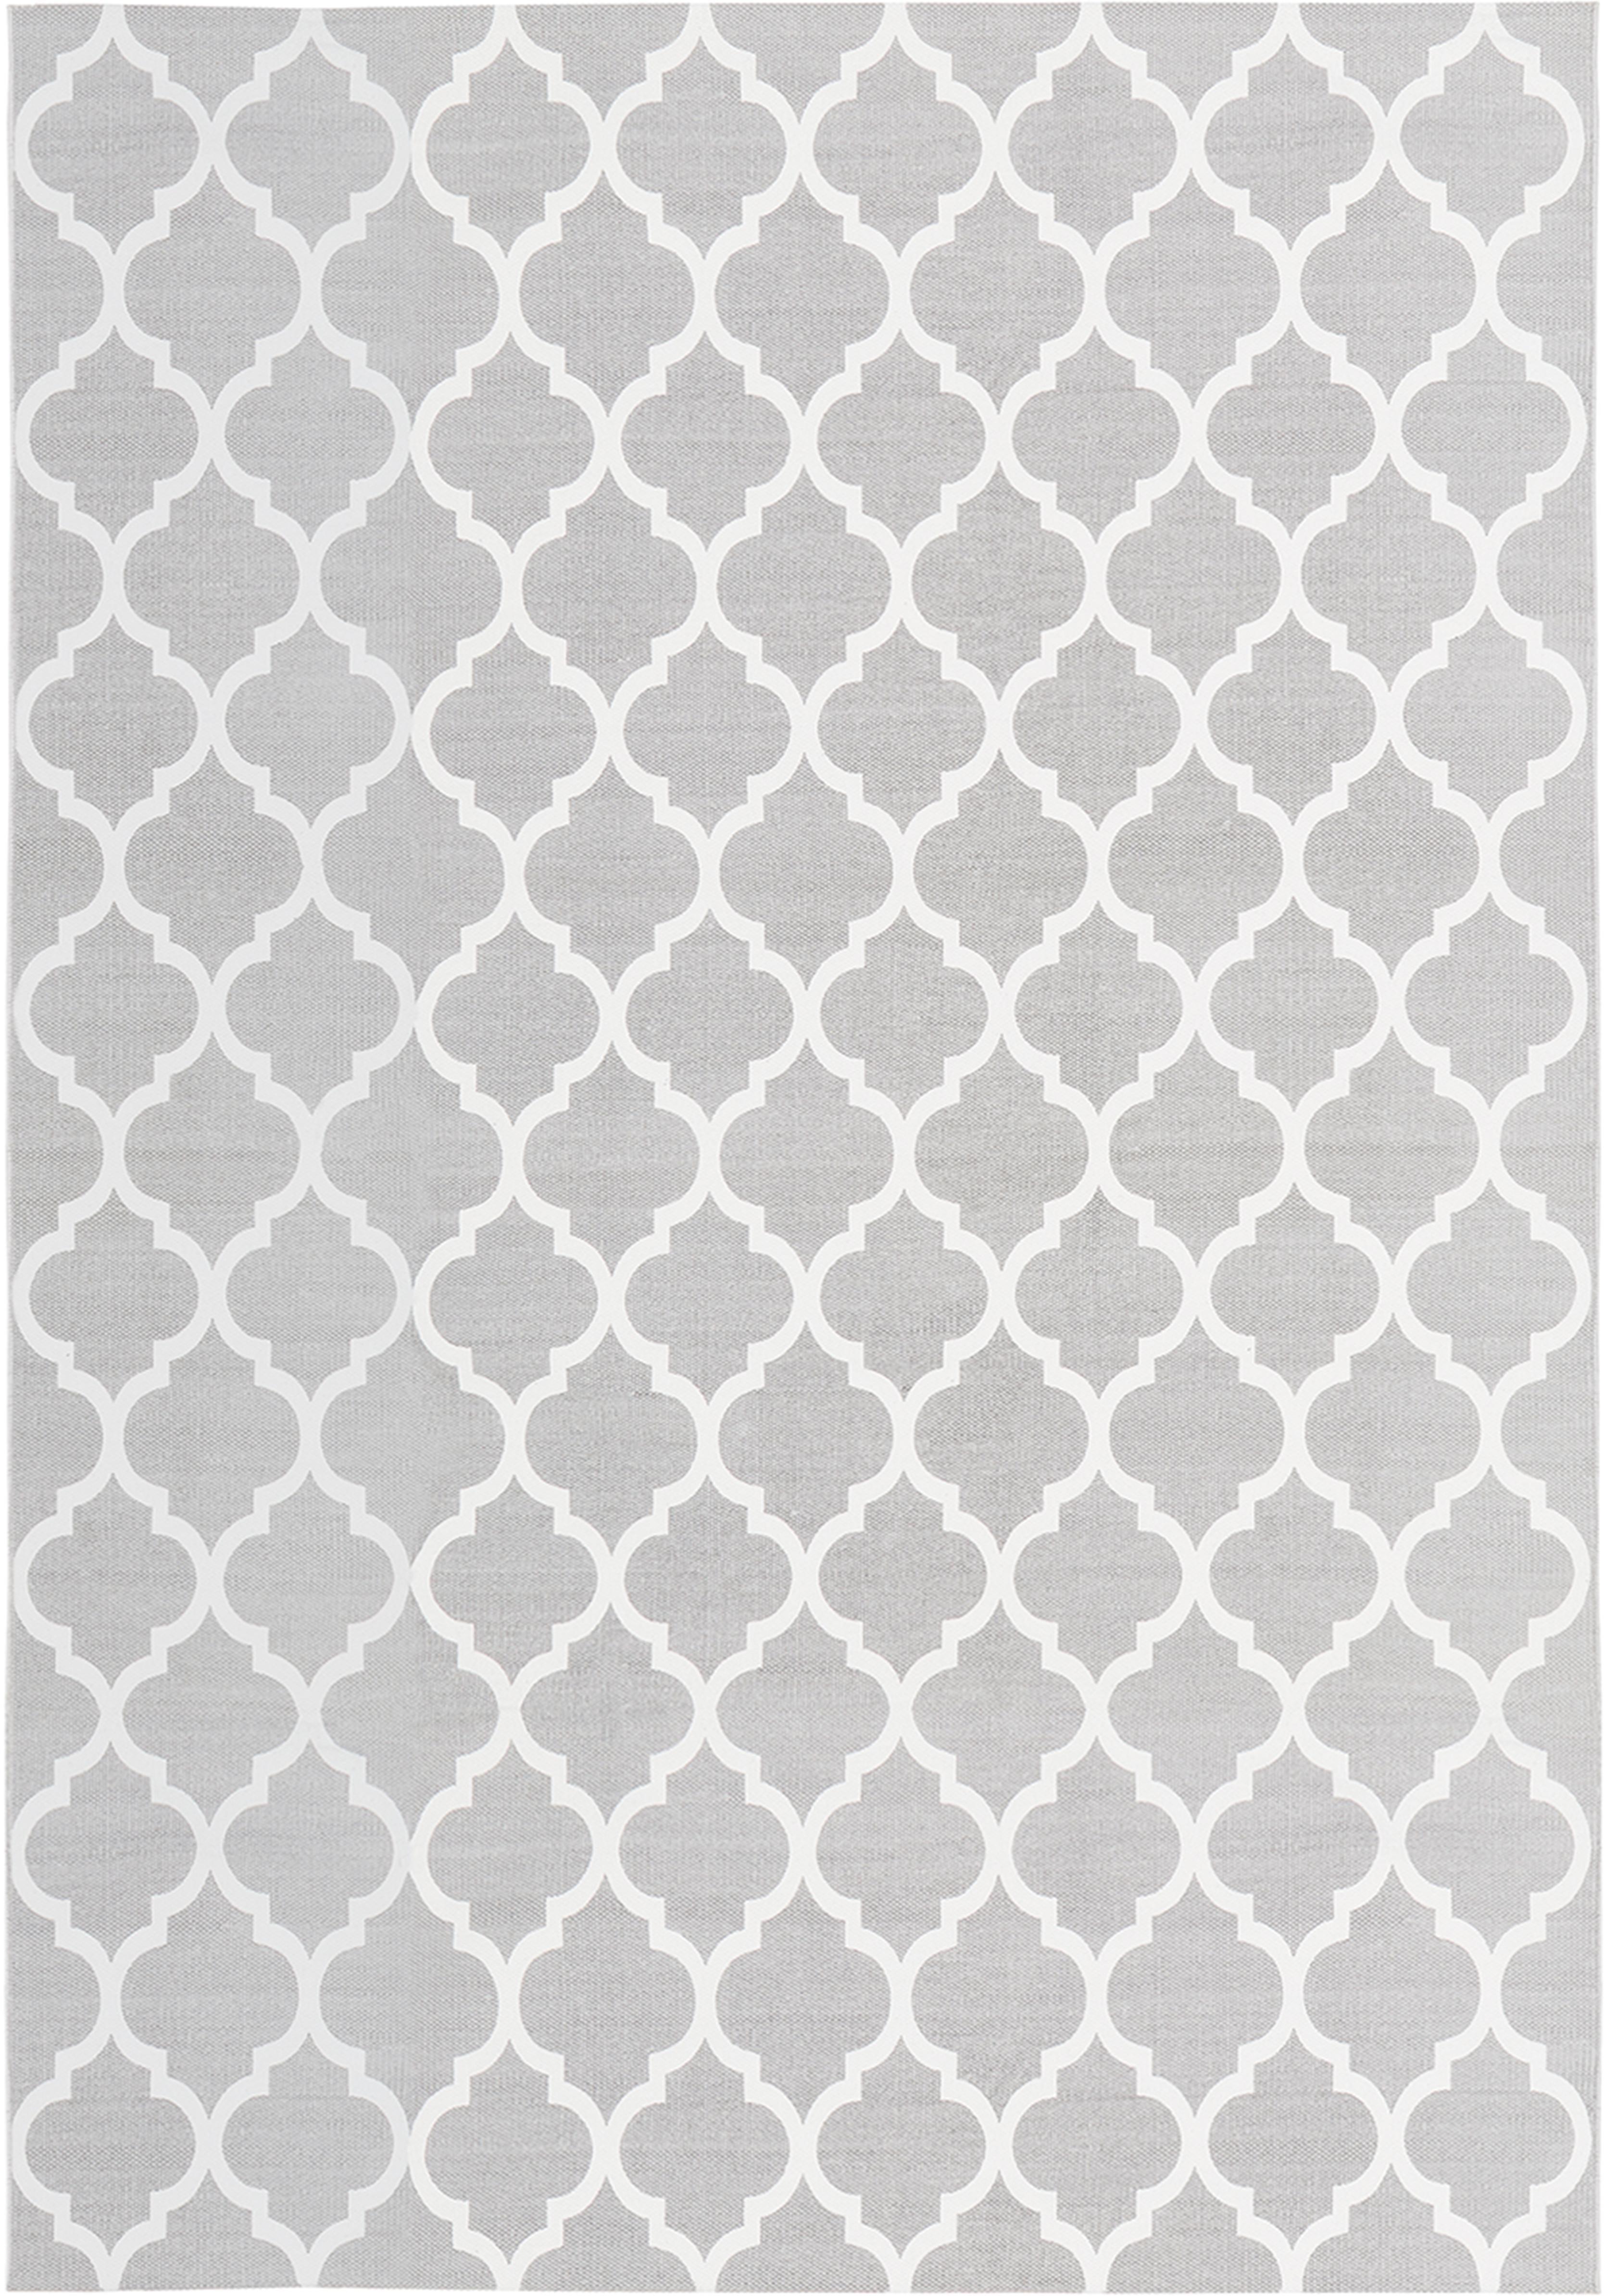 Flachgewebter Baumwollteppich Amira in Grau/Weiss, 100% Baumwolle, Hellgrau, Cremeweiss, B 160 x L 230 cm (Grösse M)